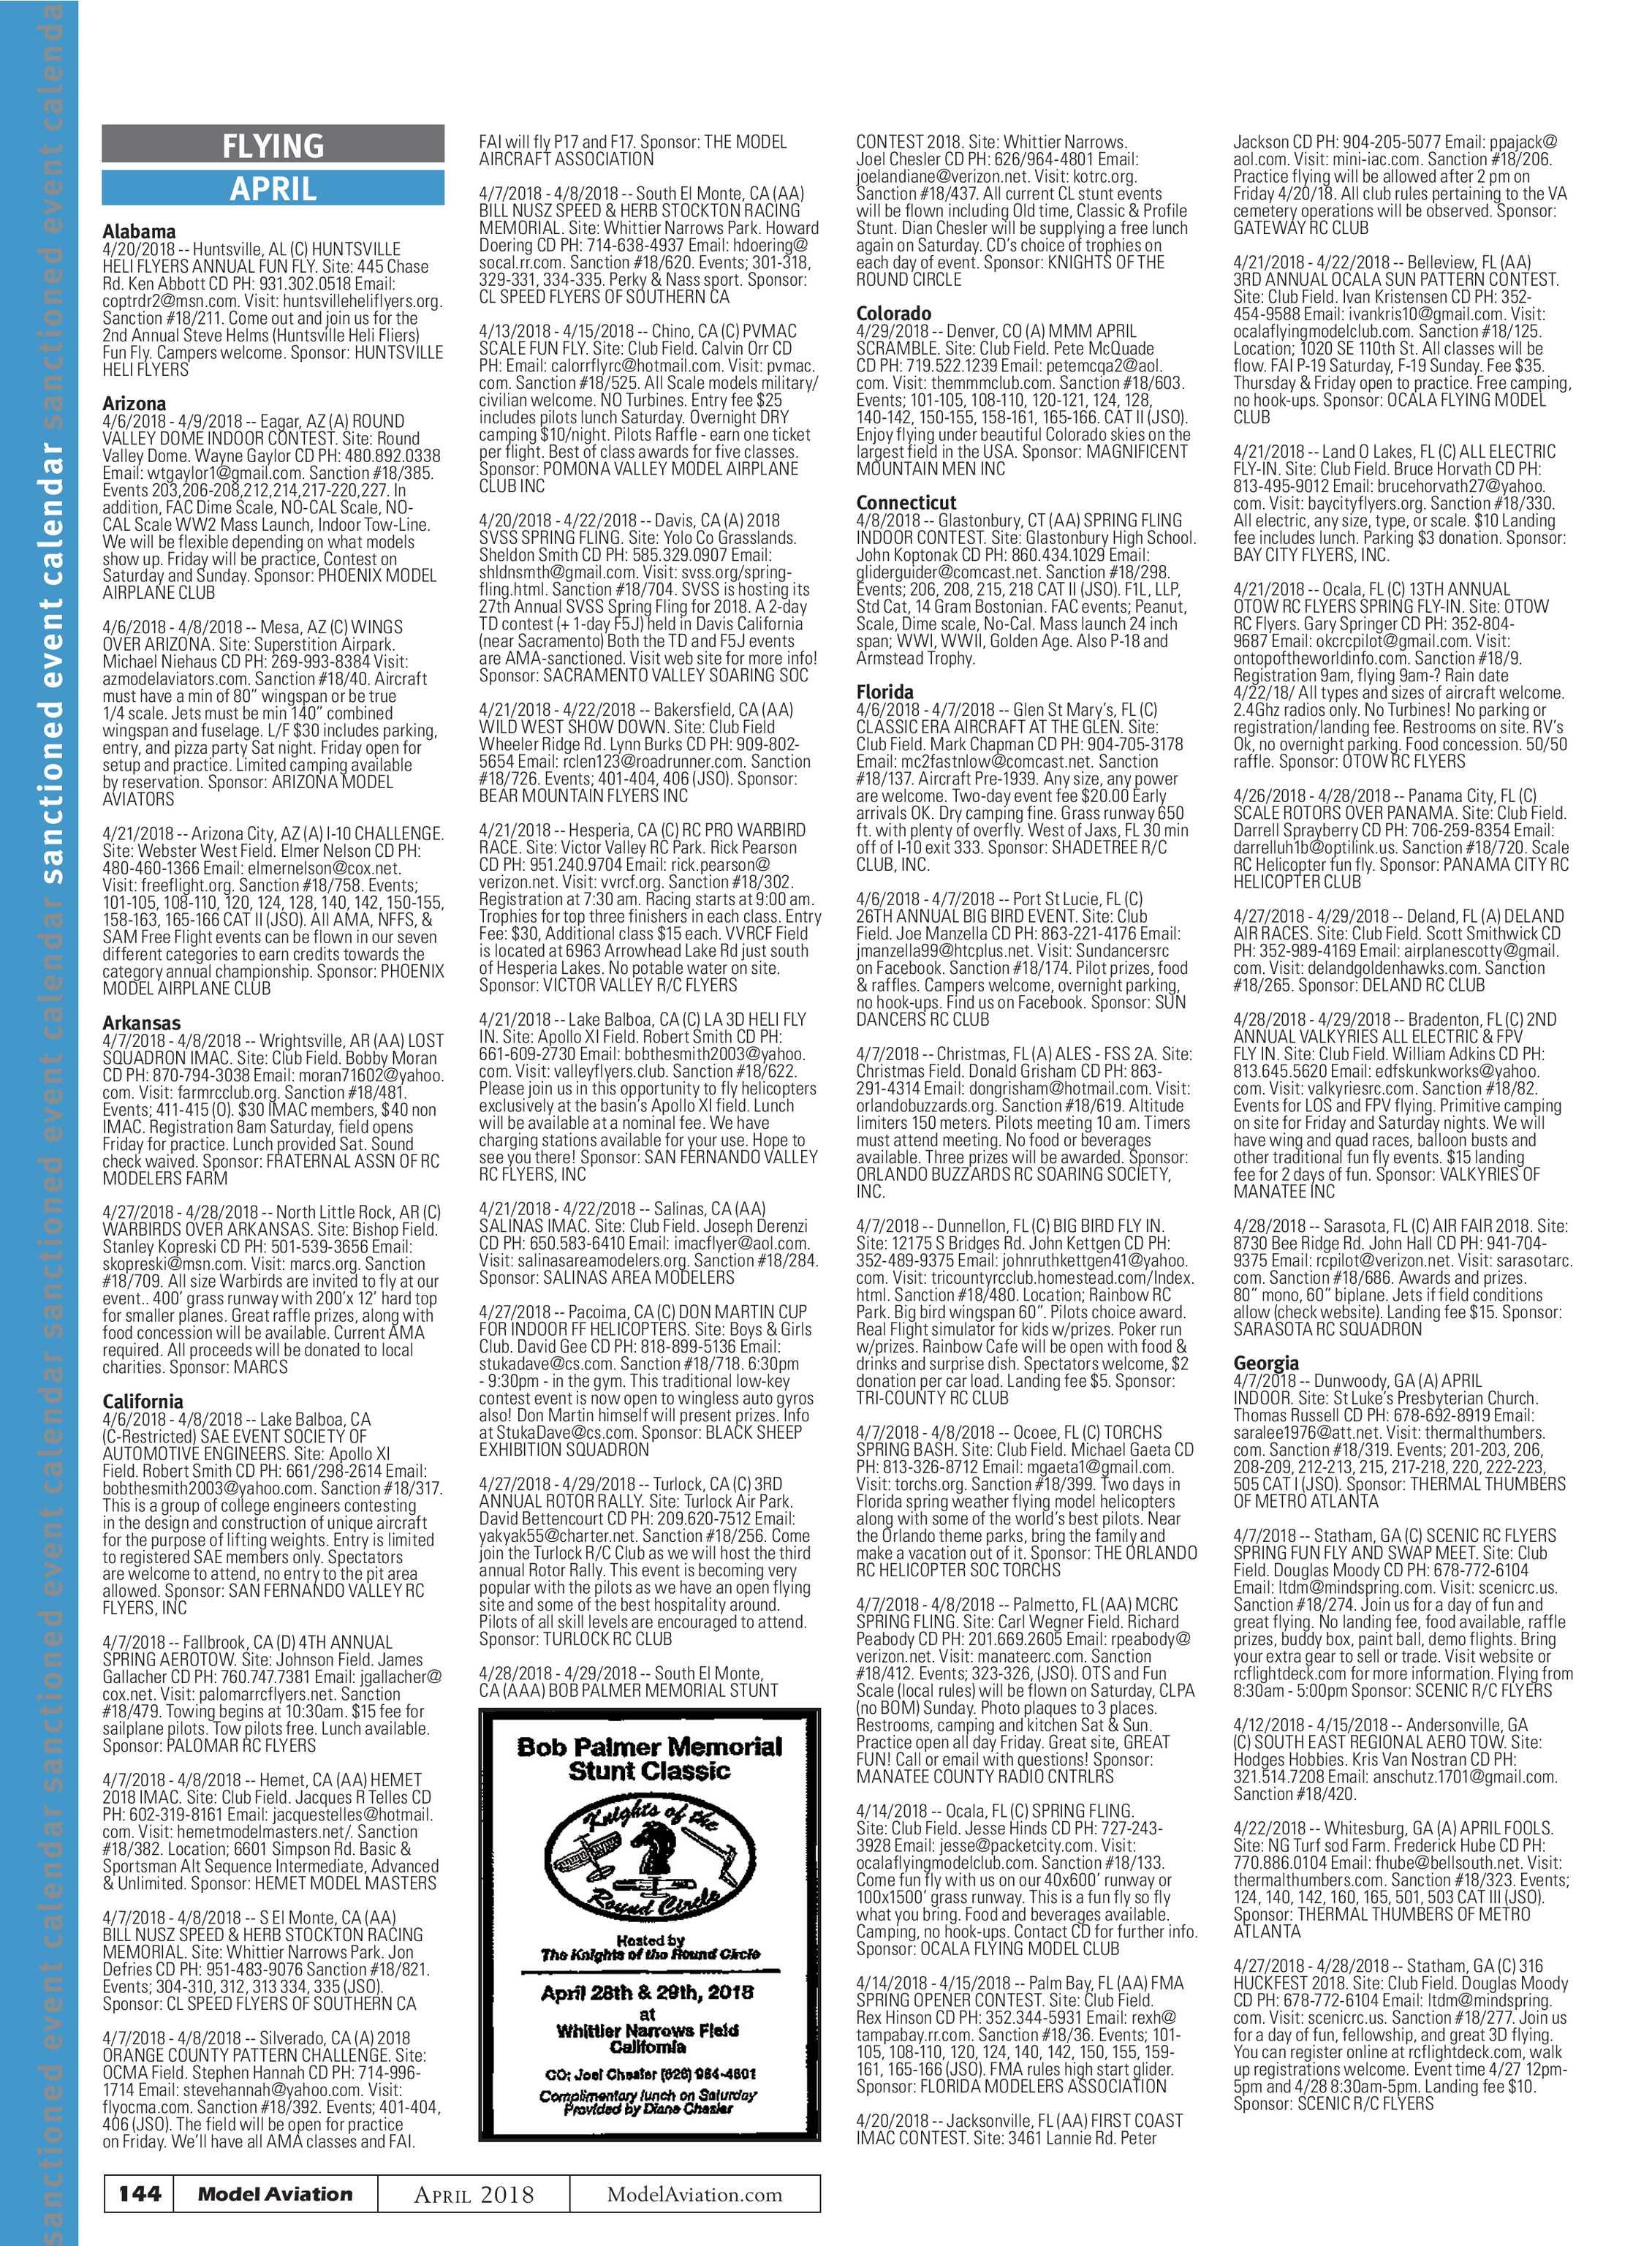 Model Aviation - April 2018 - page 144